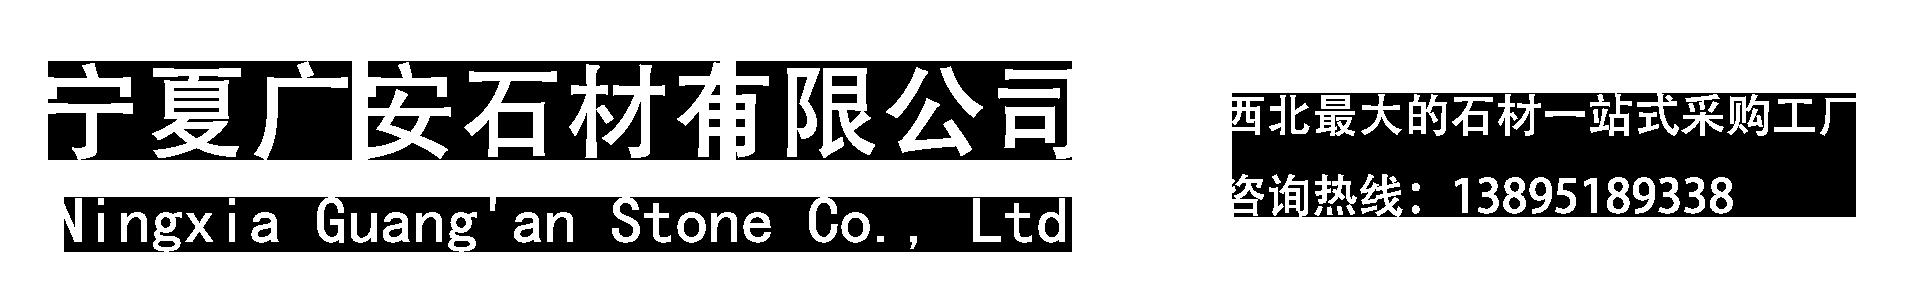 bob综合app官网下载广安bob综合app官网登录有限公司